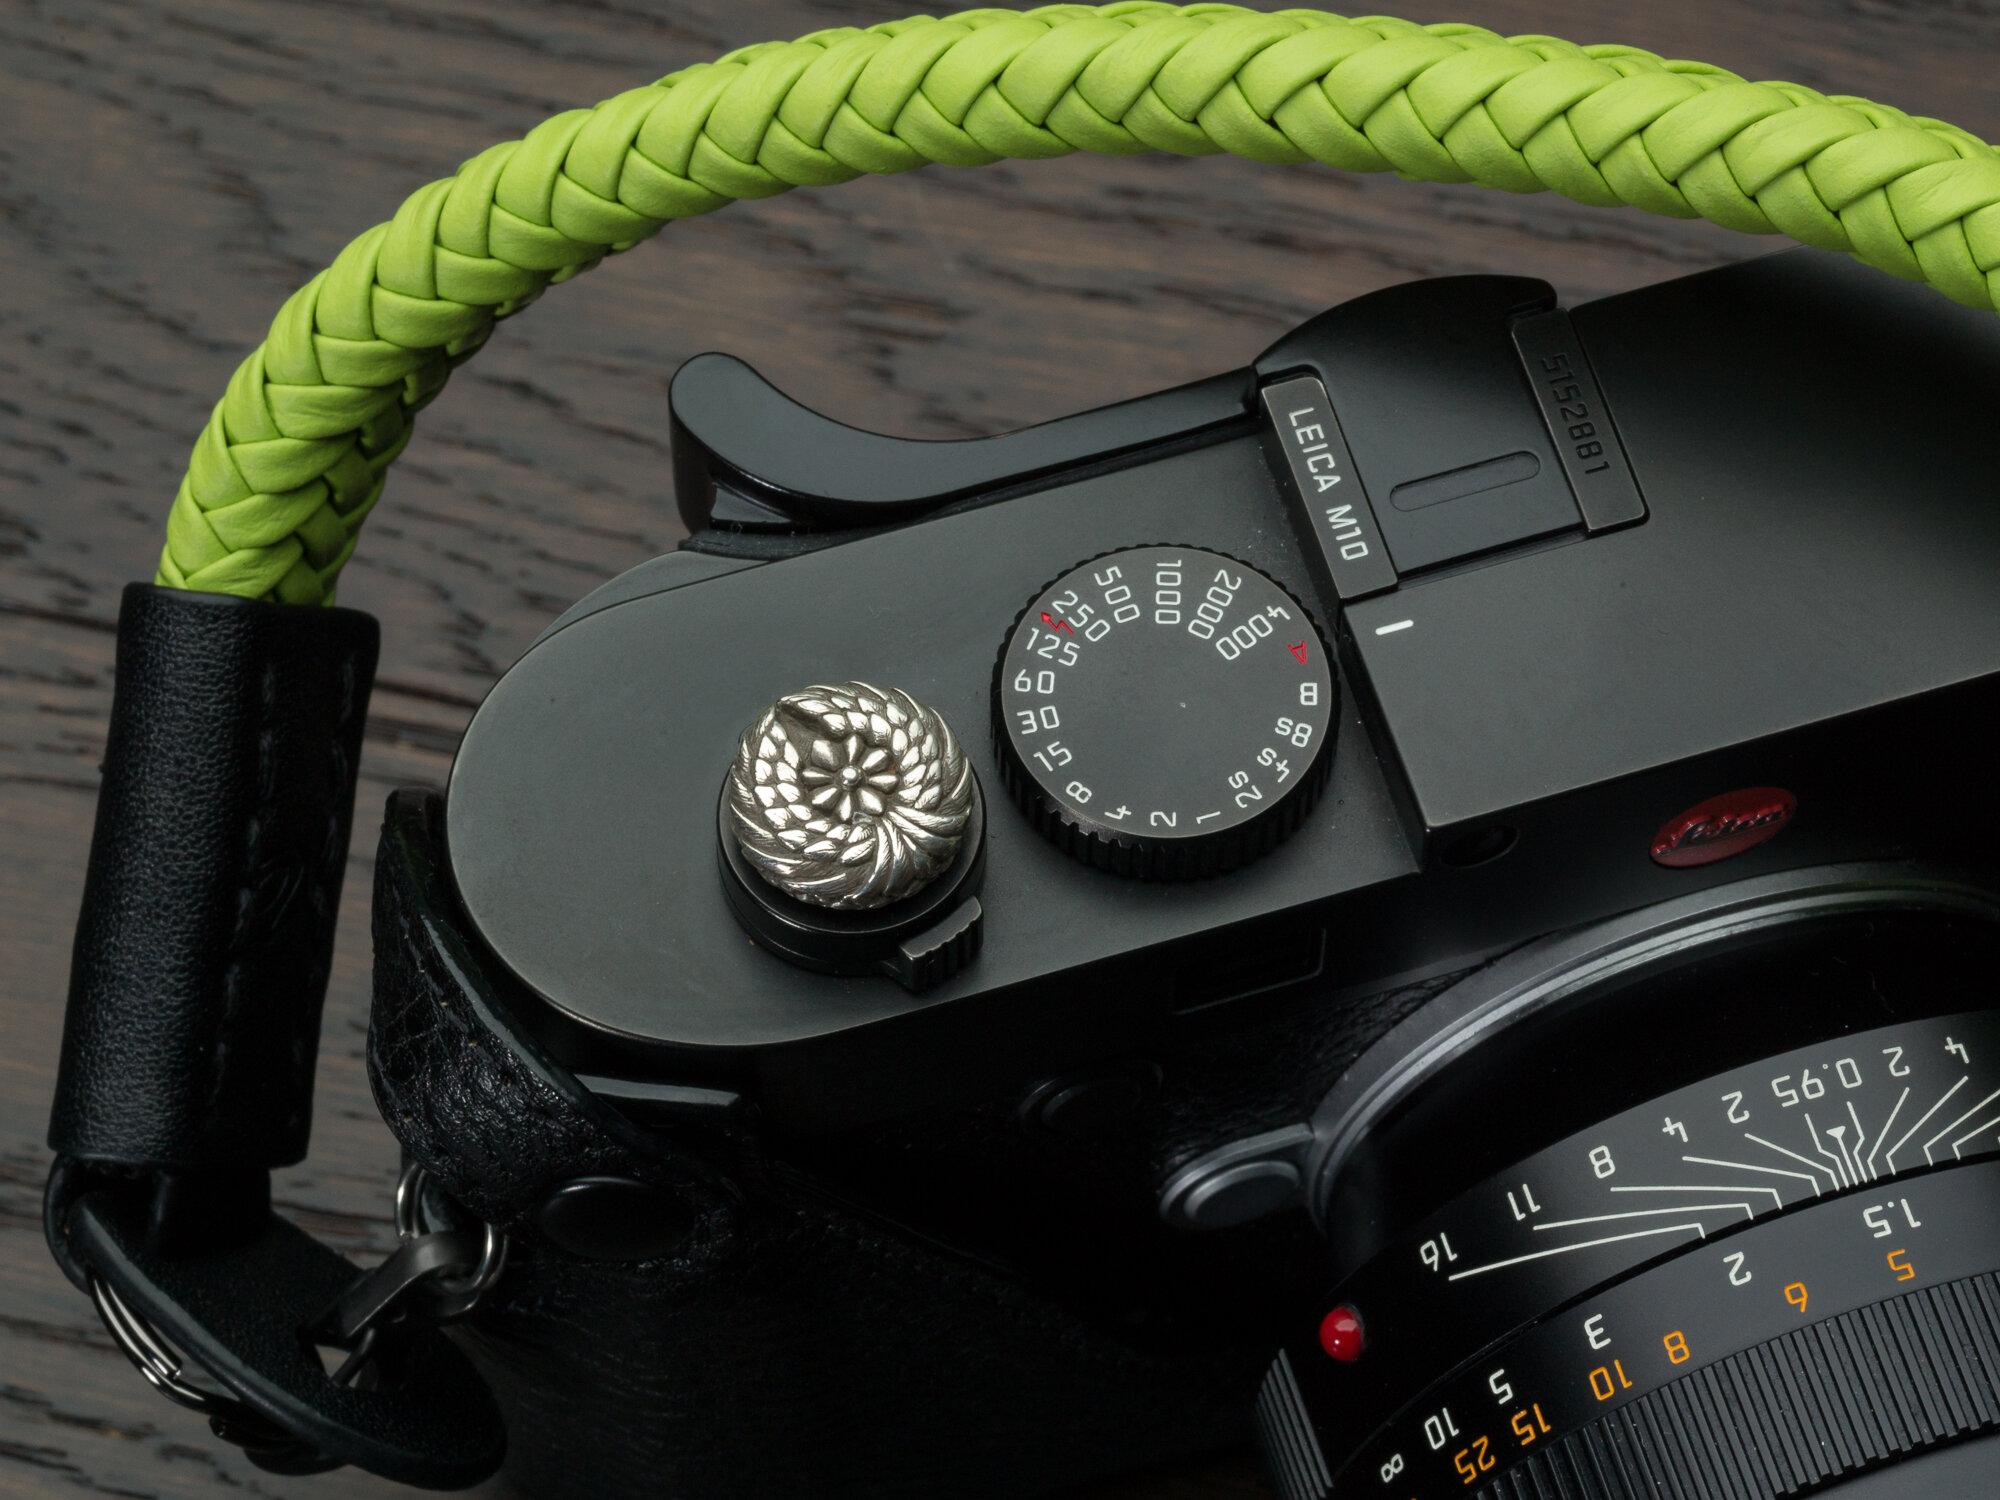 VV garuda ithaca Strap Leica M.jpg